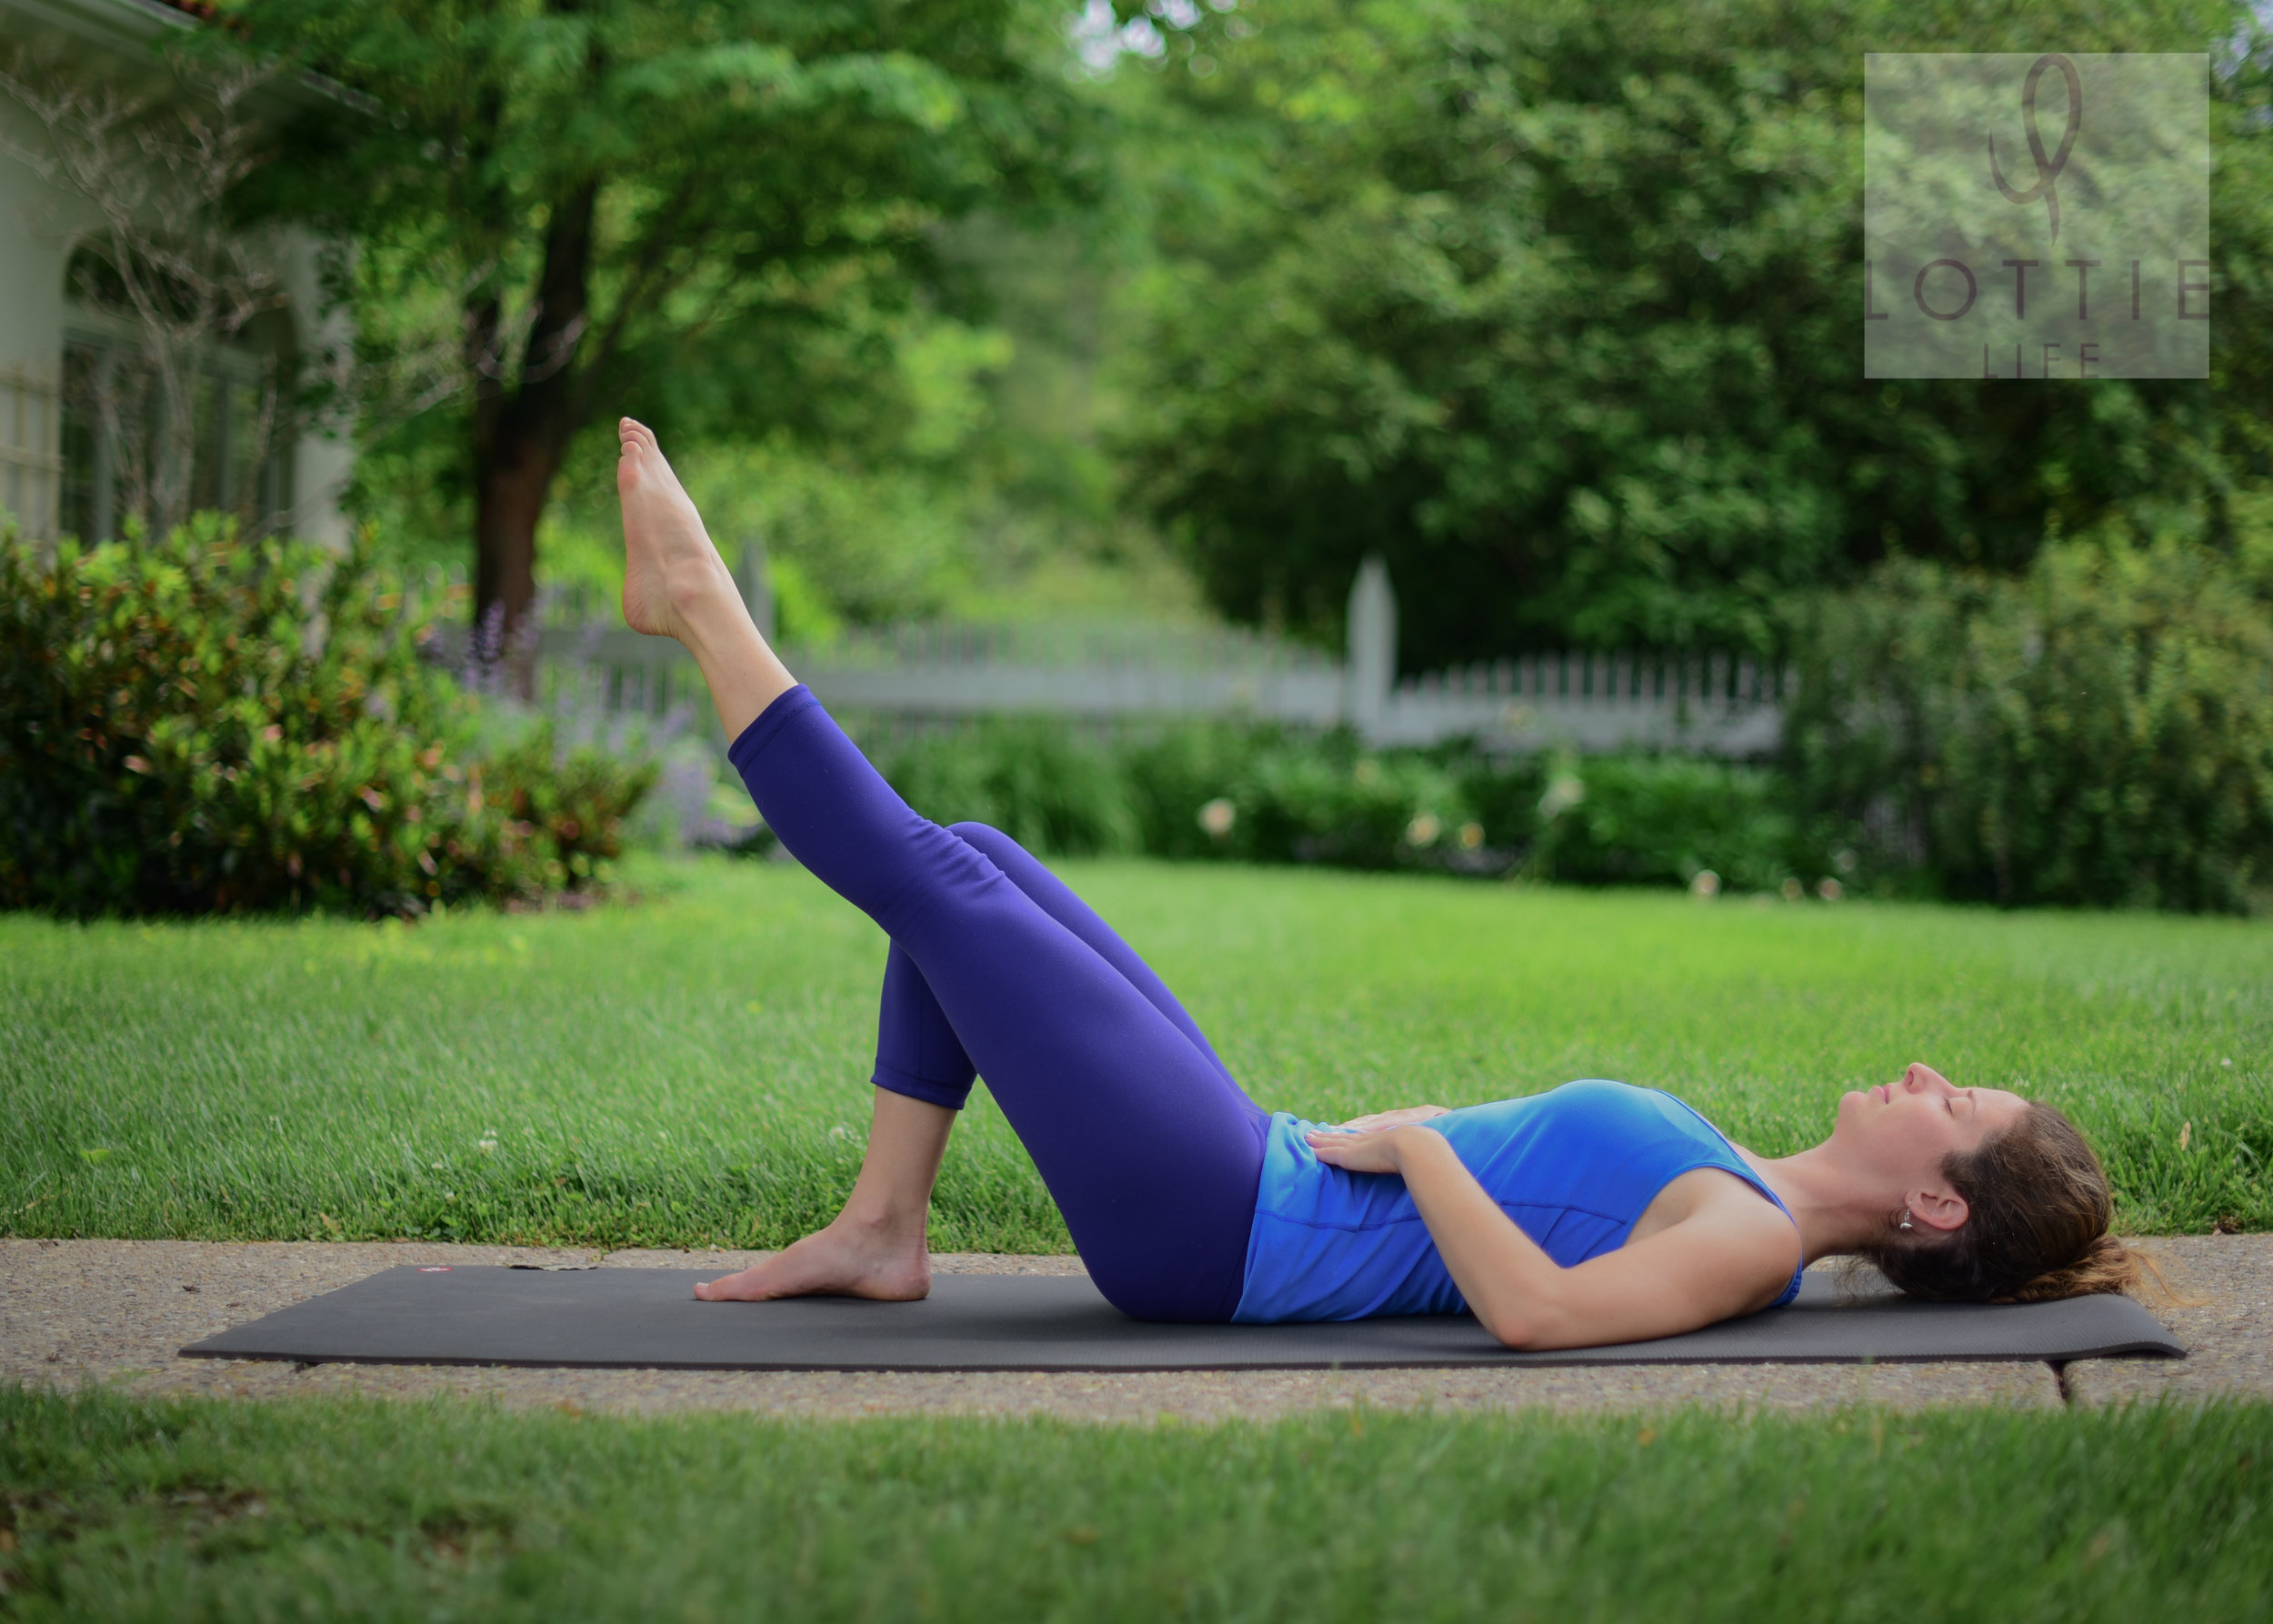 Lottie Life_Abs Part 2_Exercise 4b_Leg Lifts.jpg